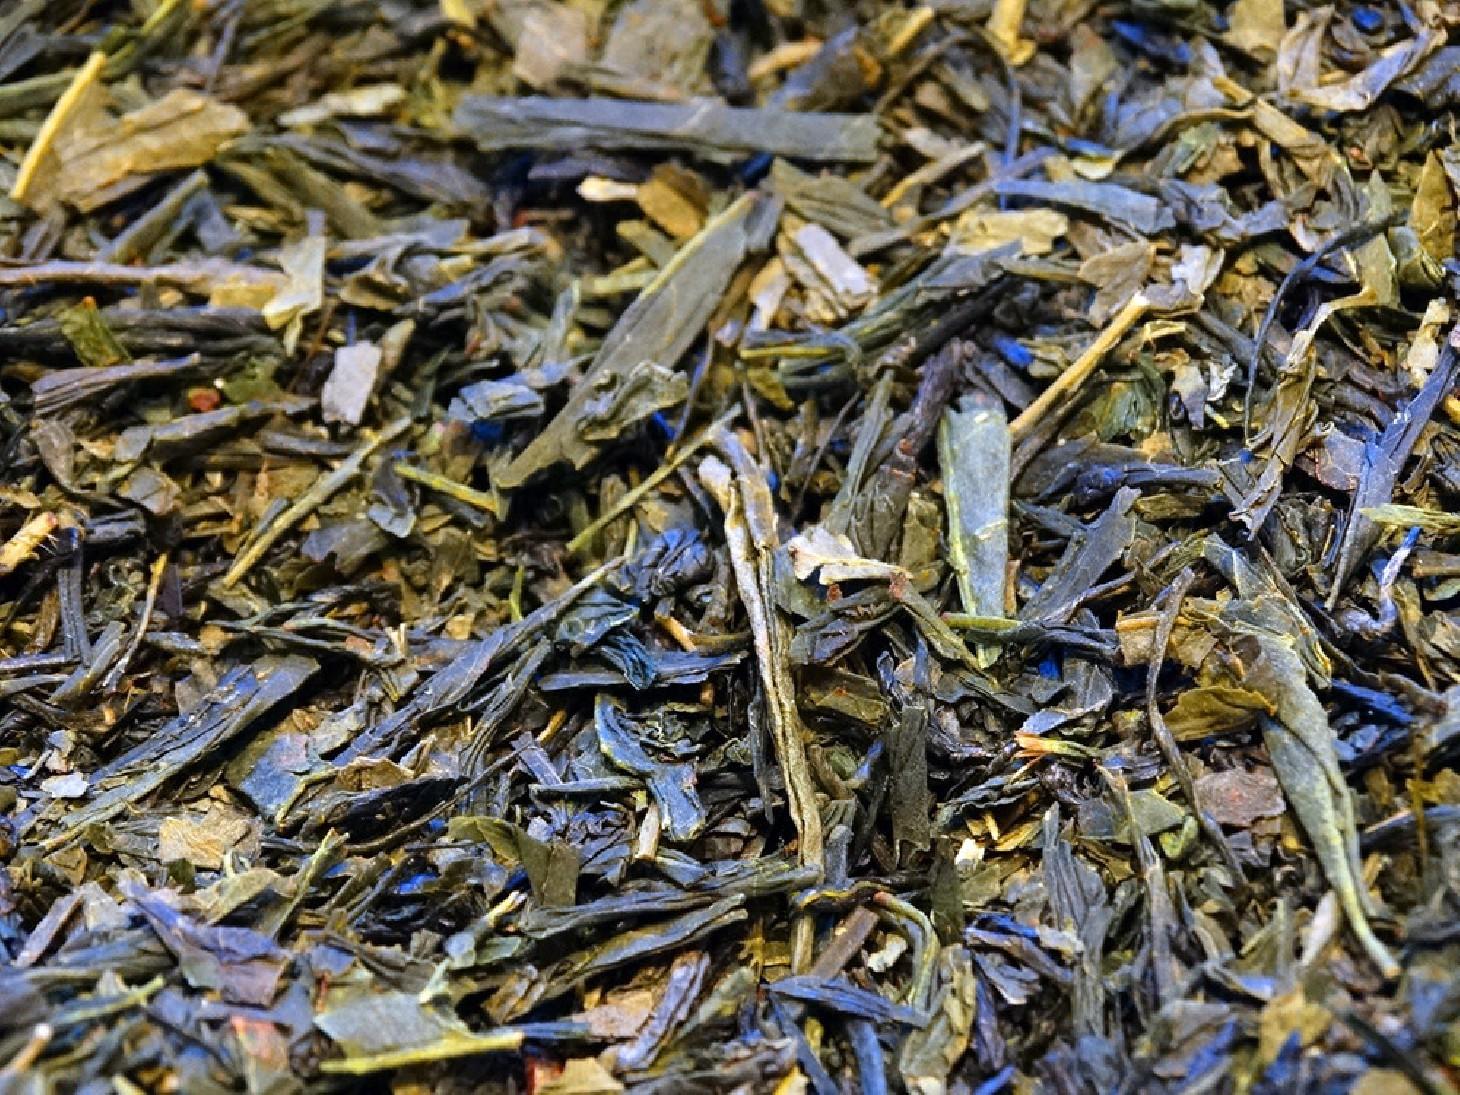 Green tea Sencha from Japan, District of Kakegawa